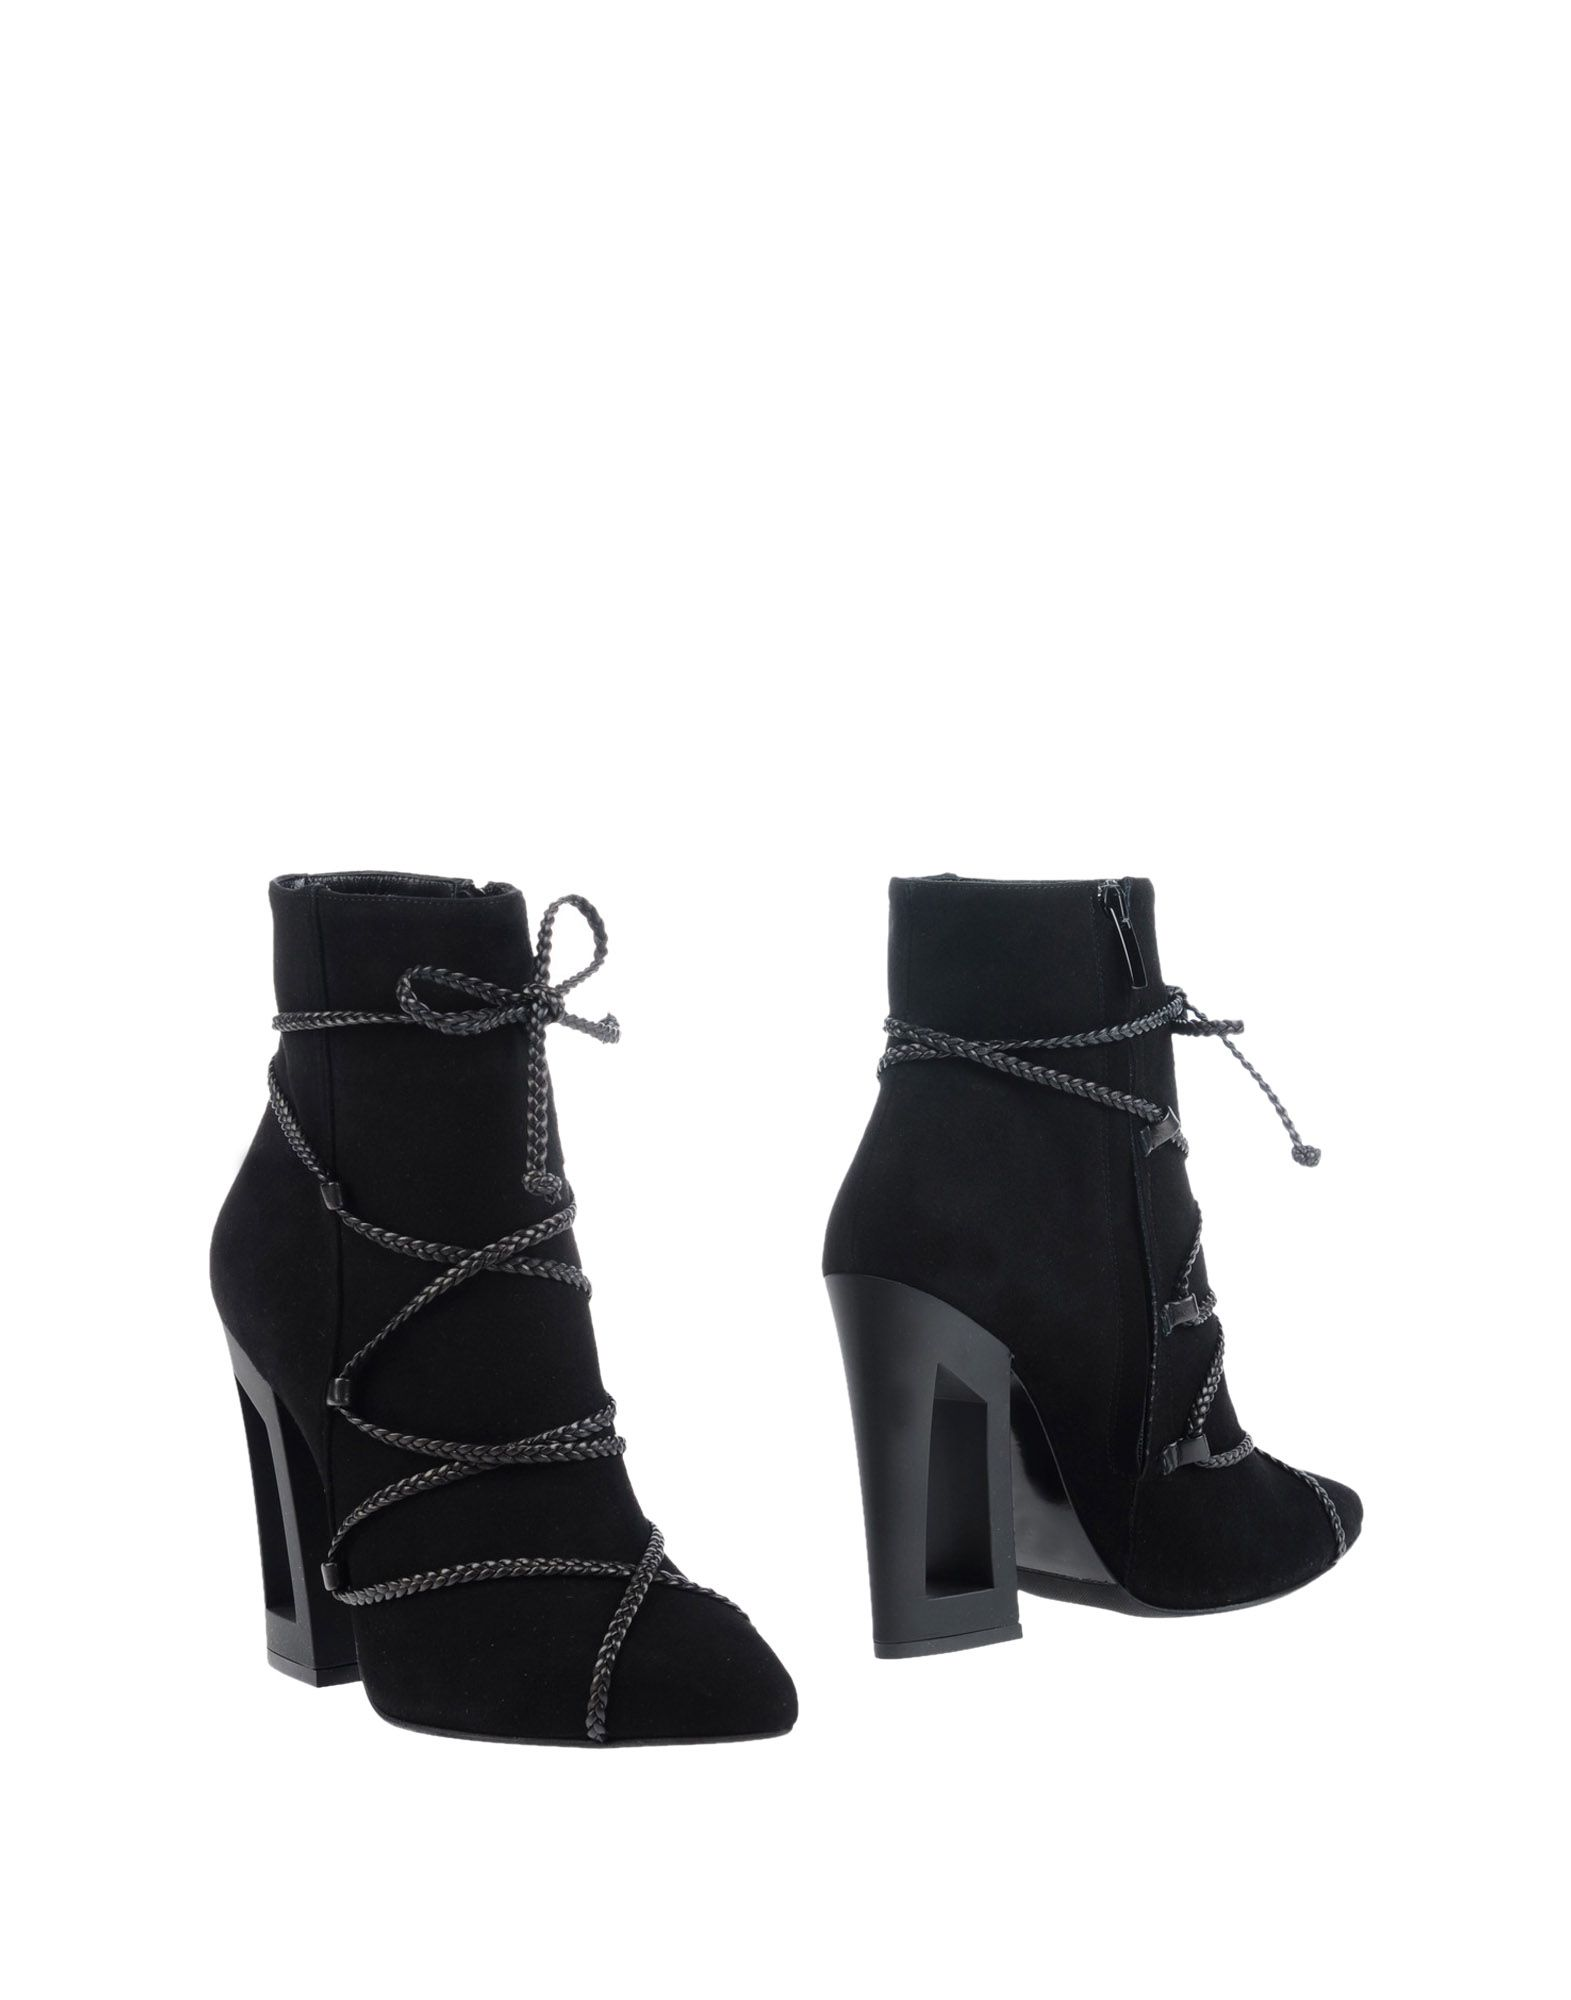 Stilvolle billige Schuhe Damen Marc Ellis Stiefelette Damen Schuhe  11267988HV c432ca